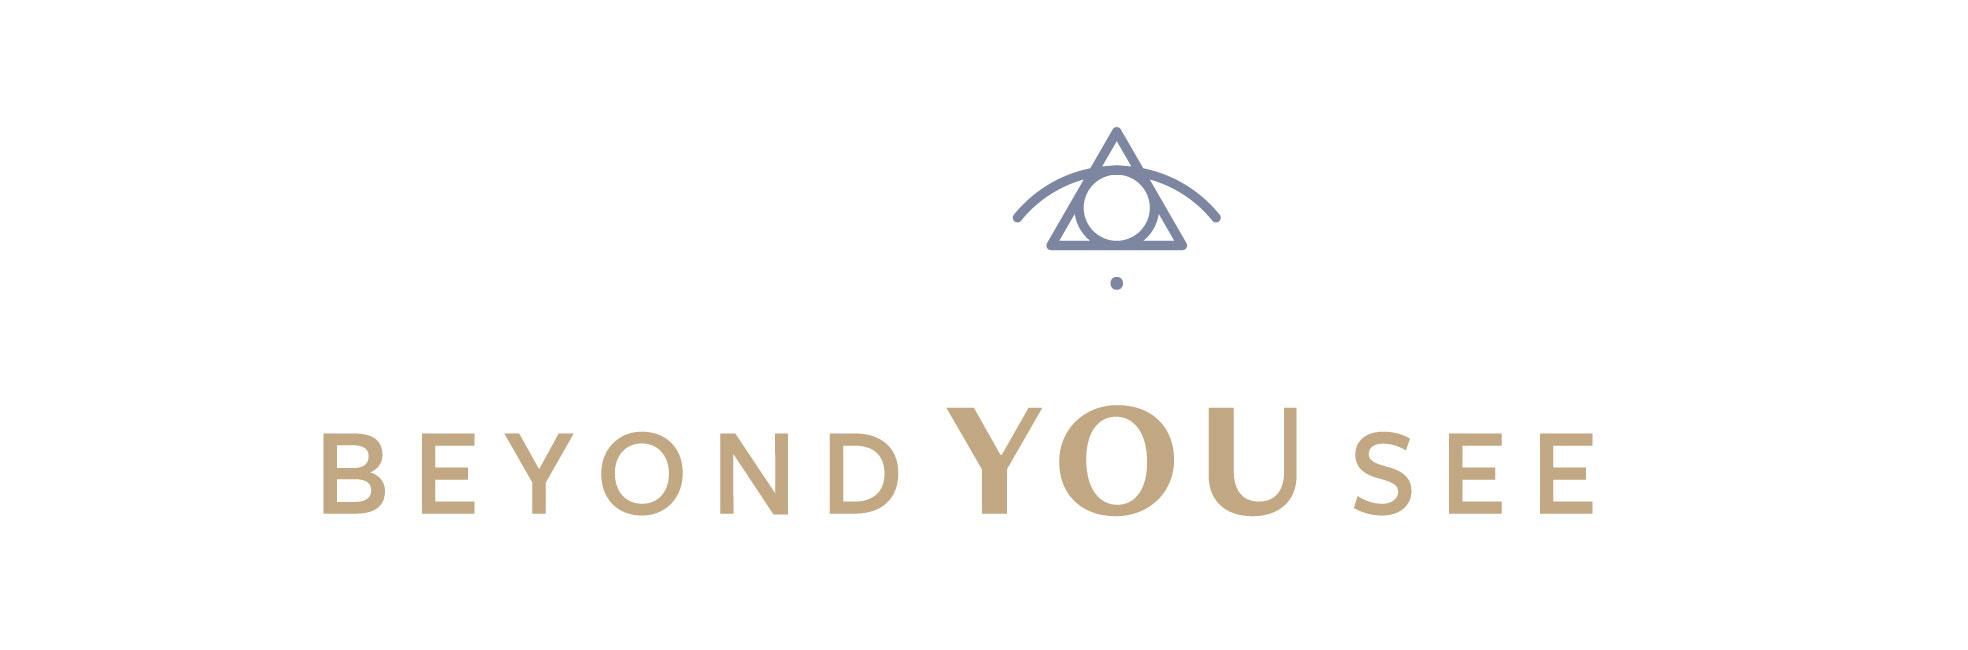 beyondYOUsee_Logo_Color_2-1